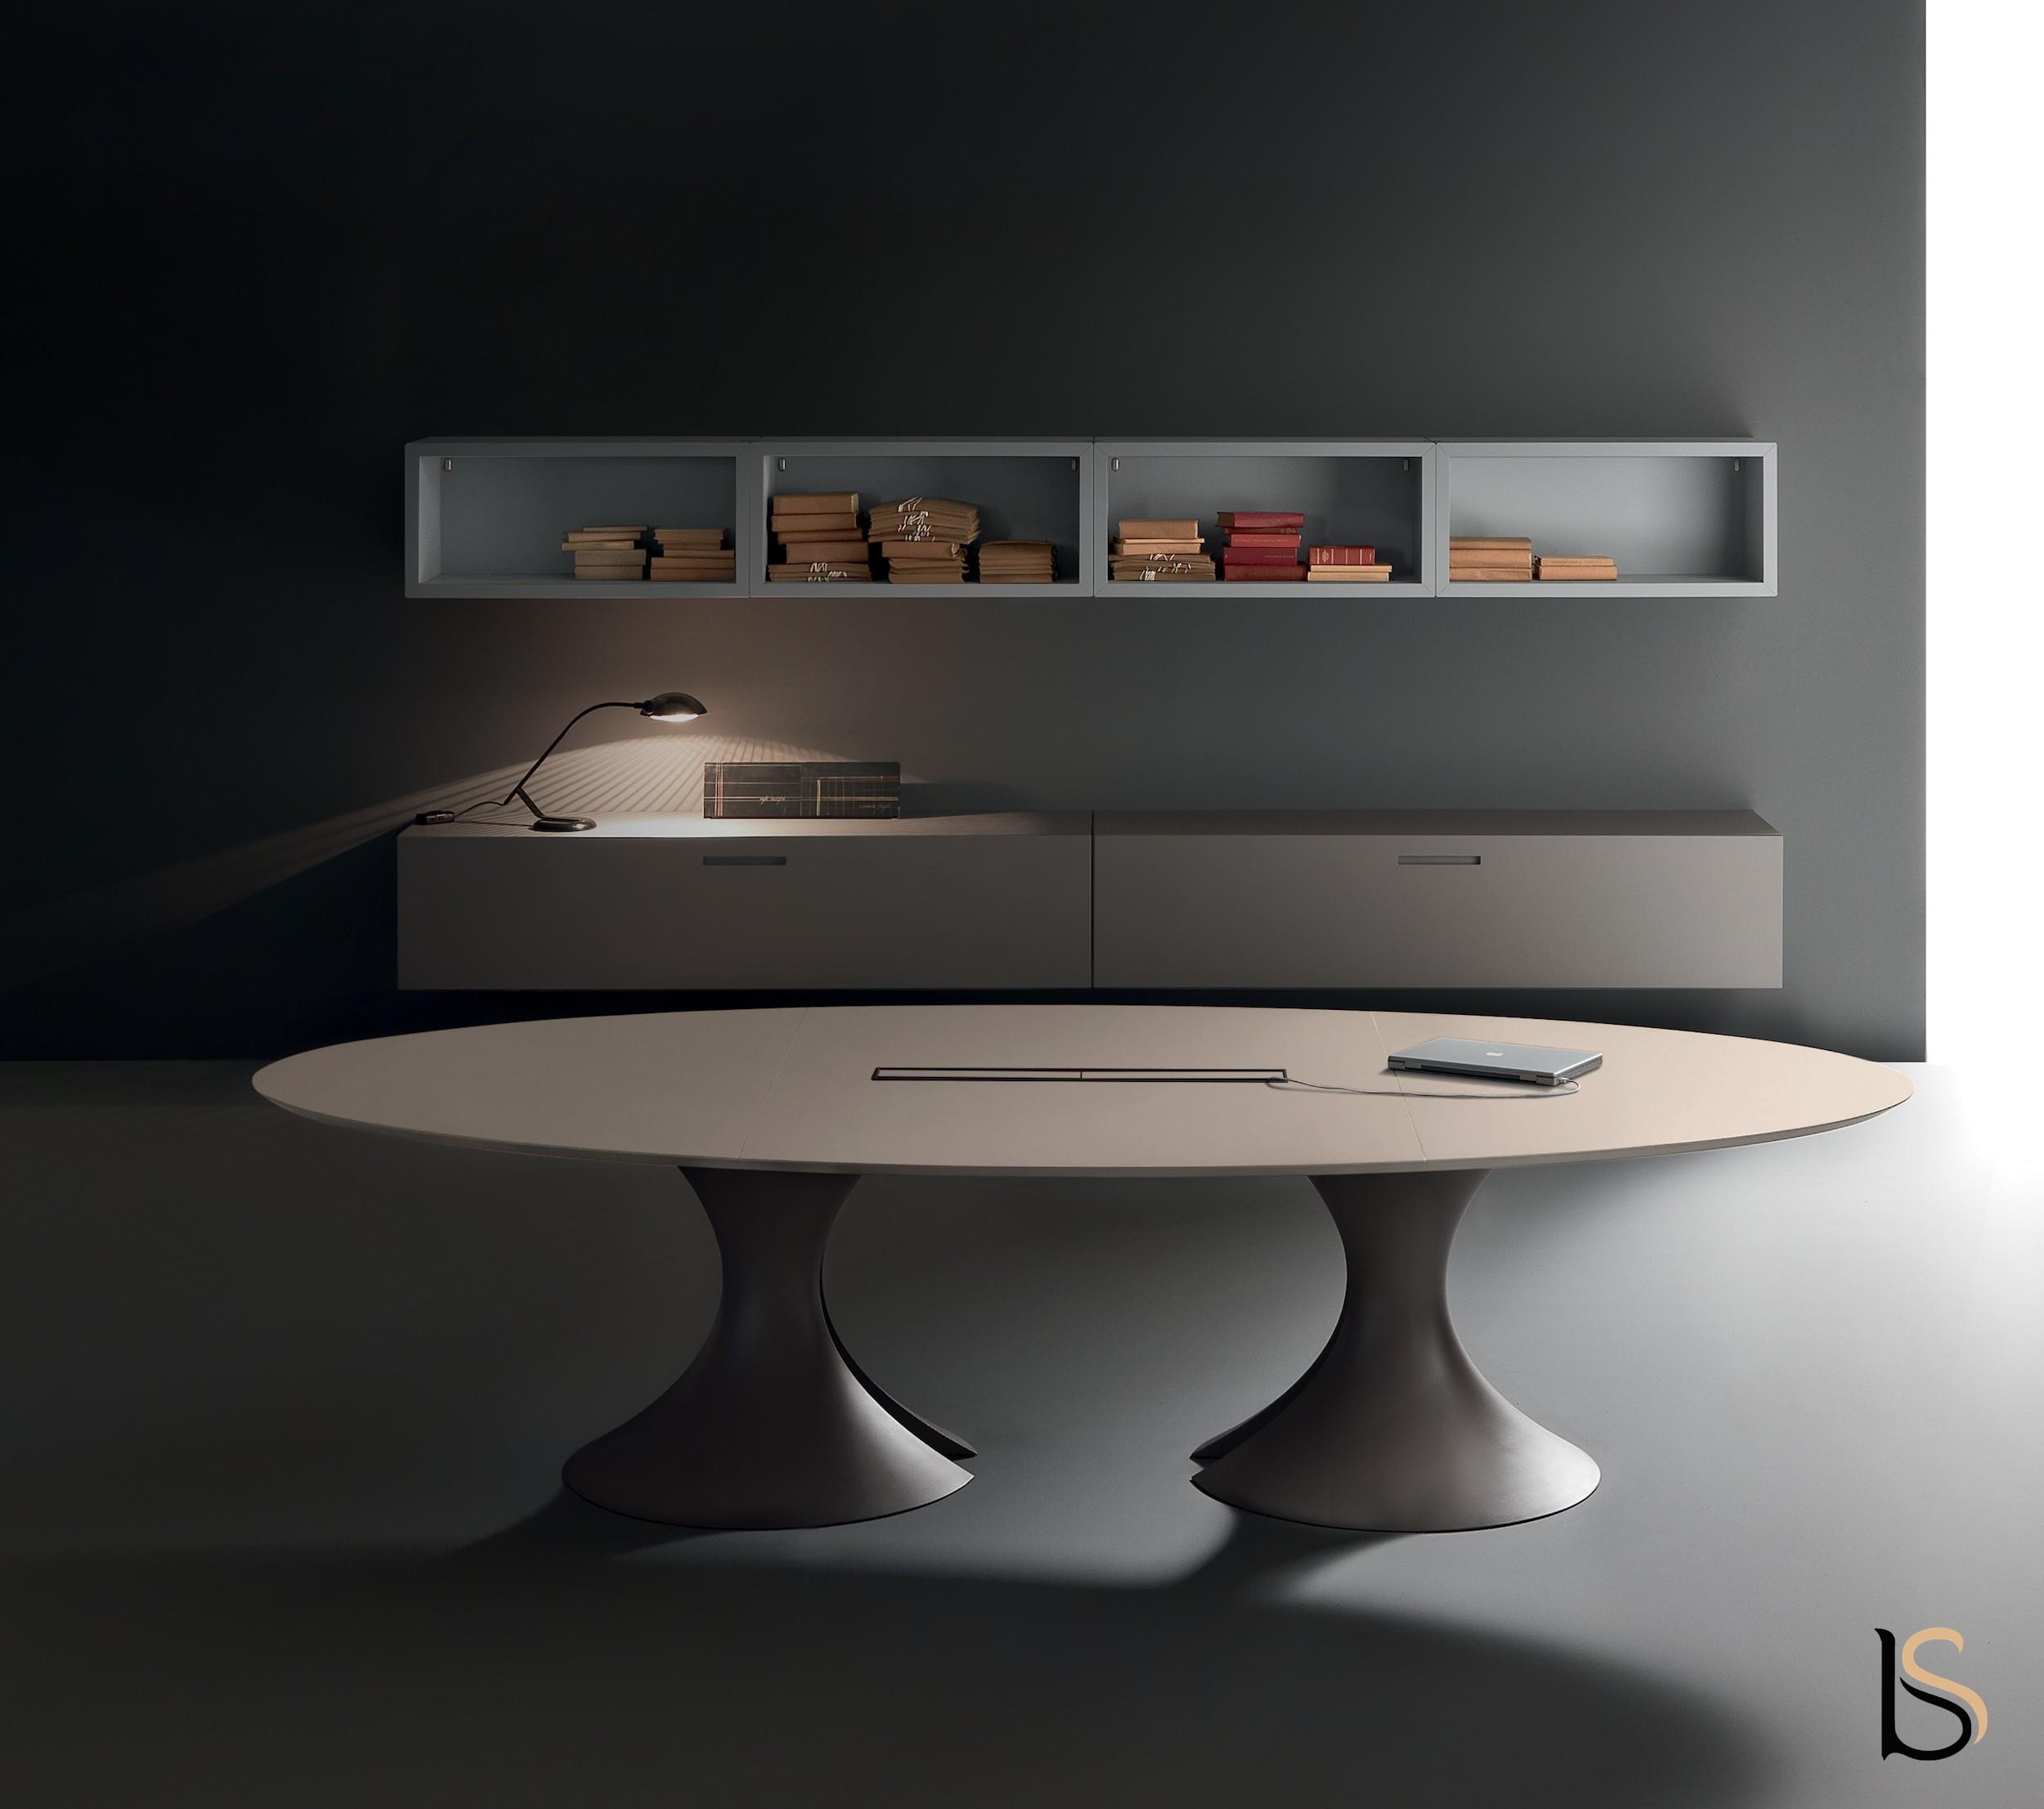 Table de réunion forme ovale Ola – Martex Tables de réunion Martex 8143c840e784